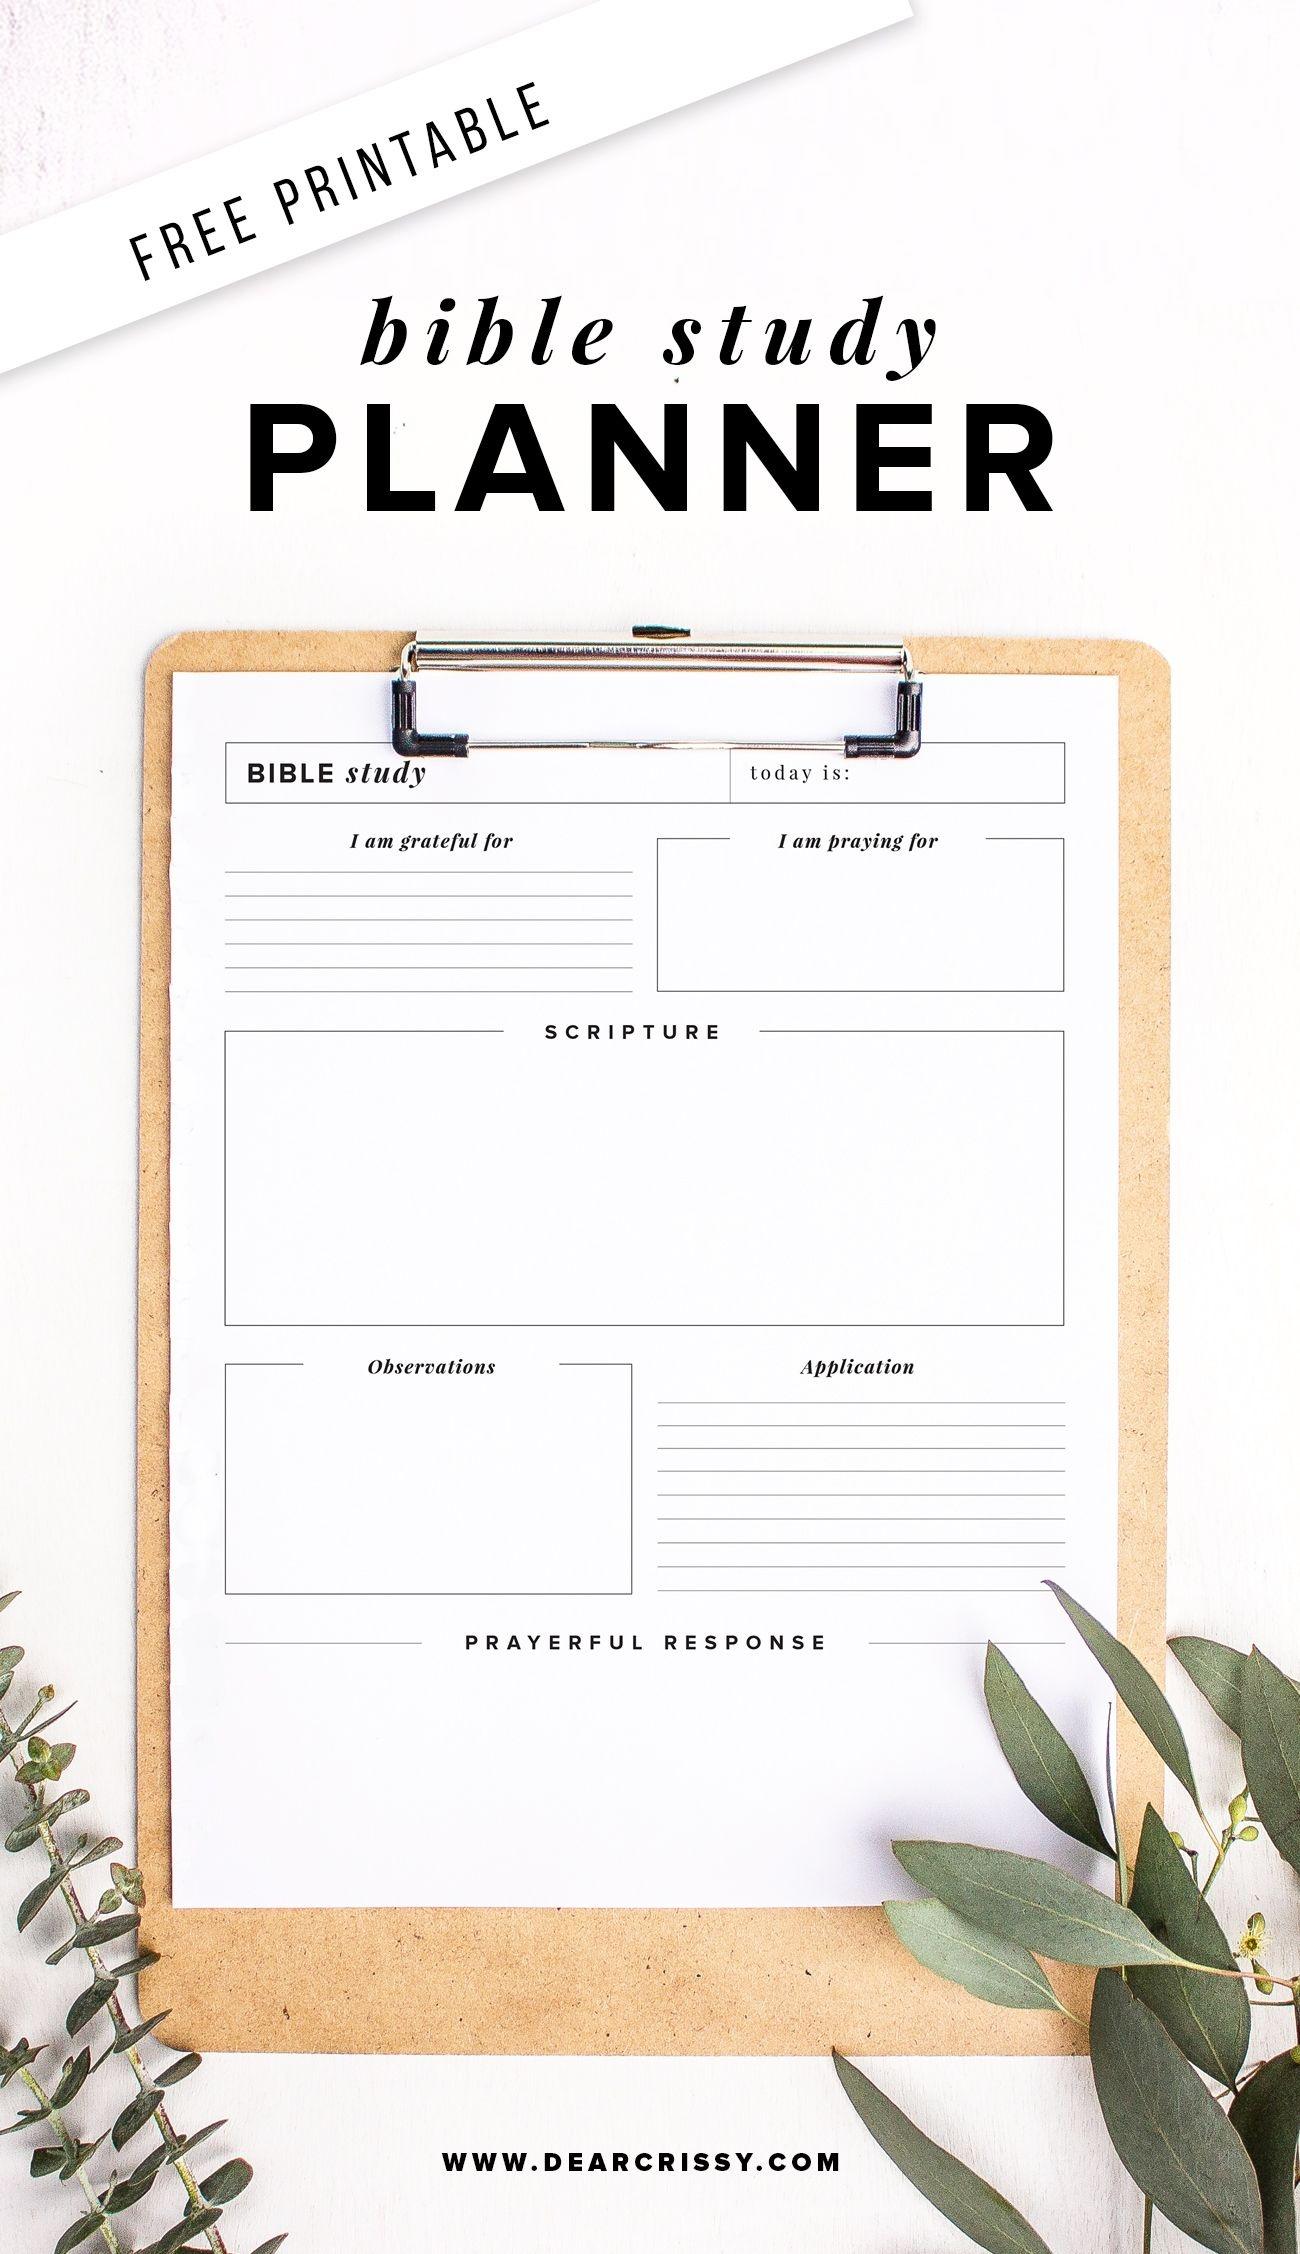 Free Printable Bible Study Planner - Soap Method Bible Study - Free Printable Bible Study Worksheets